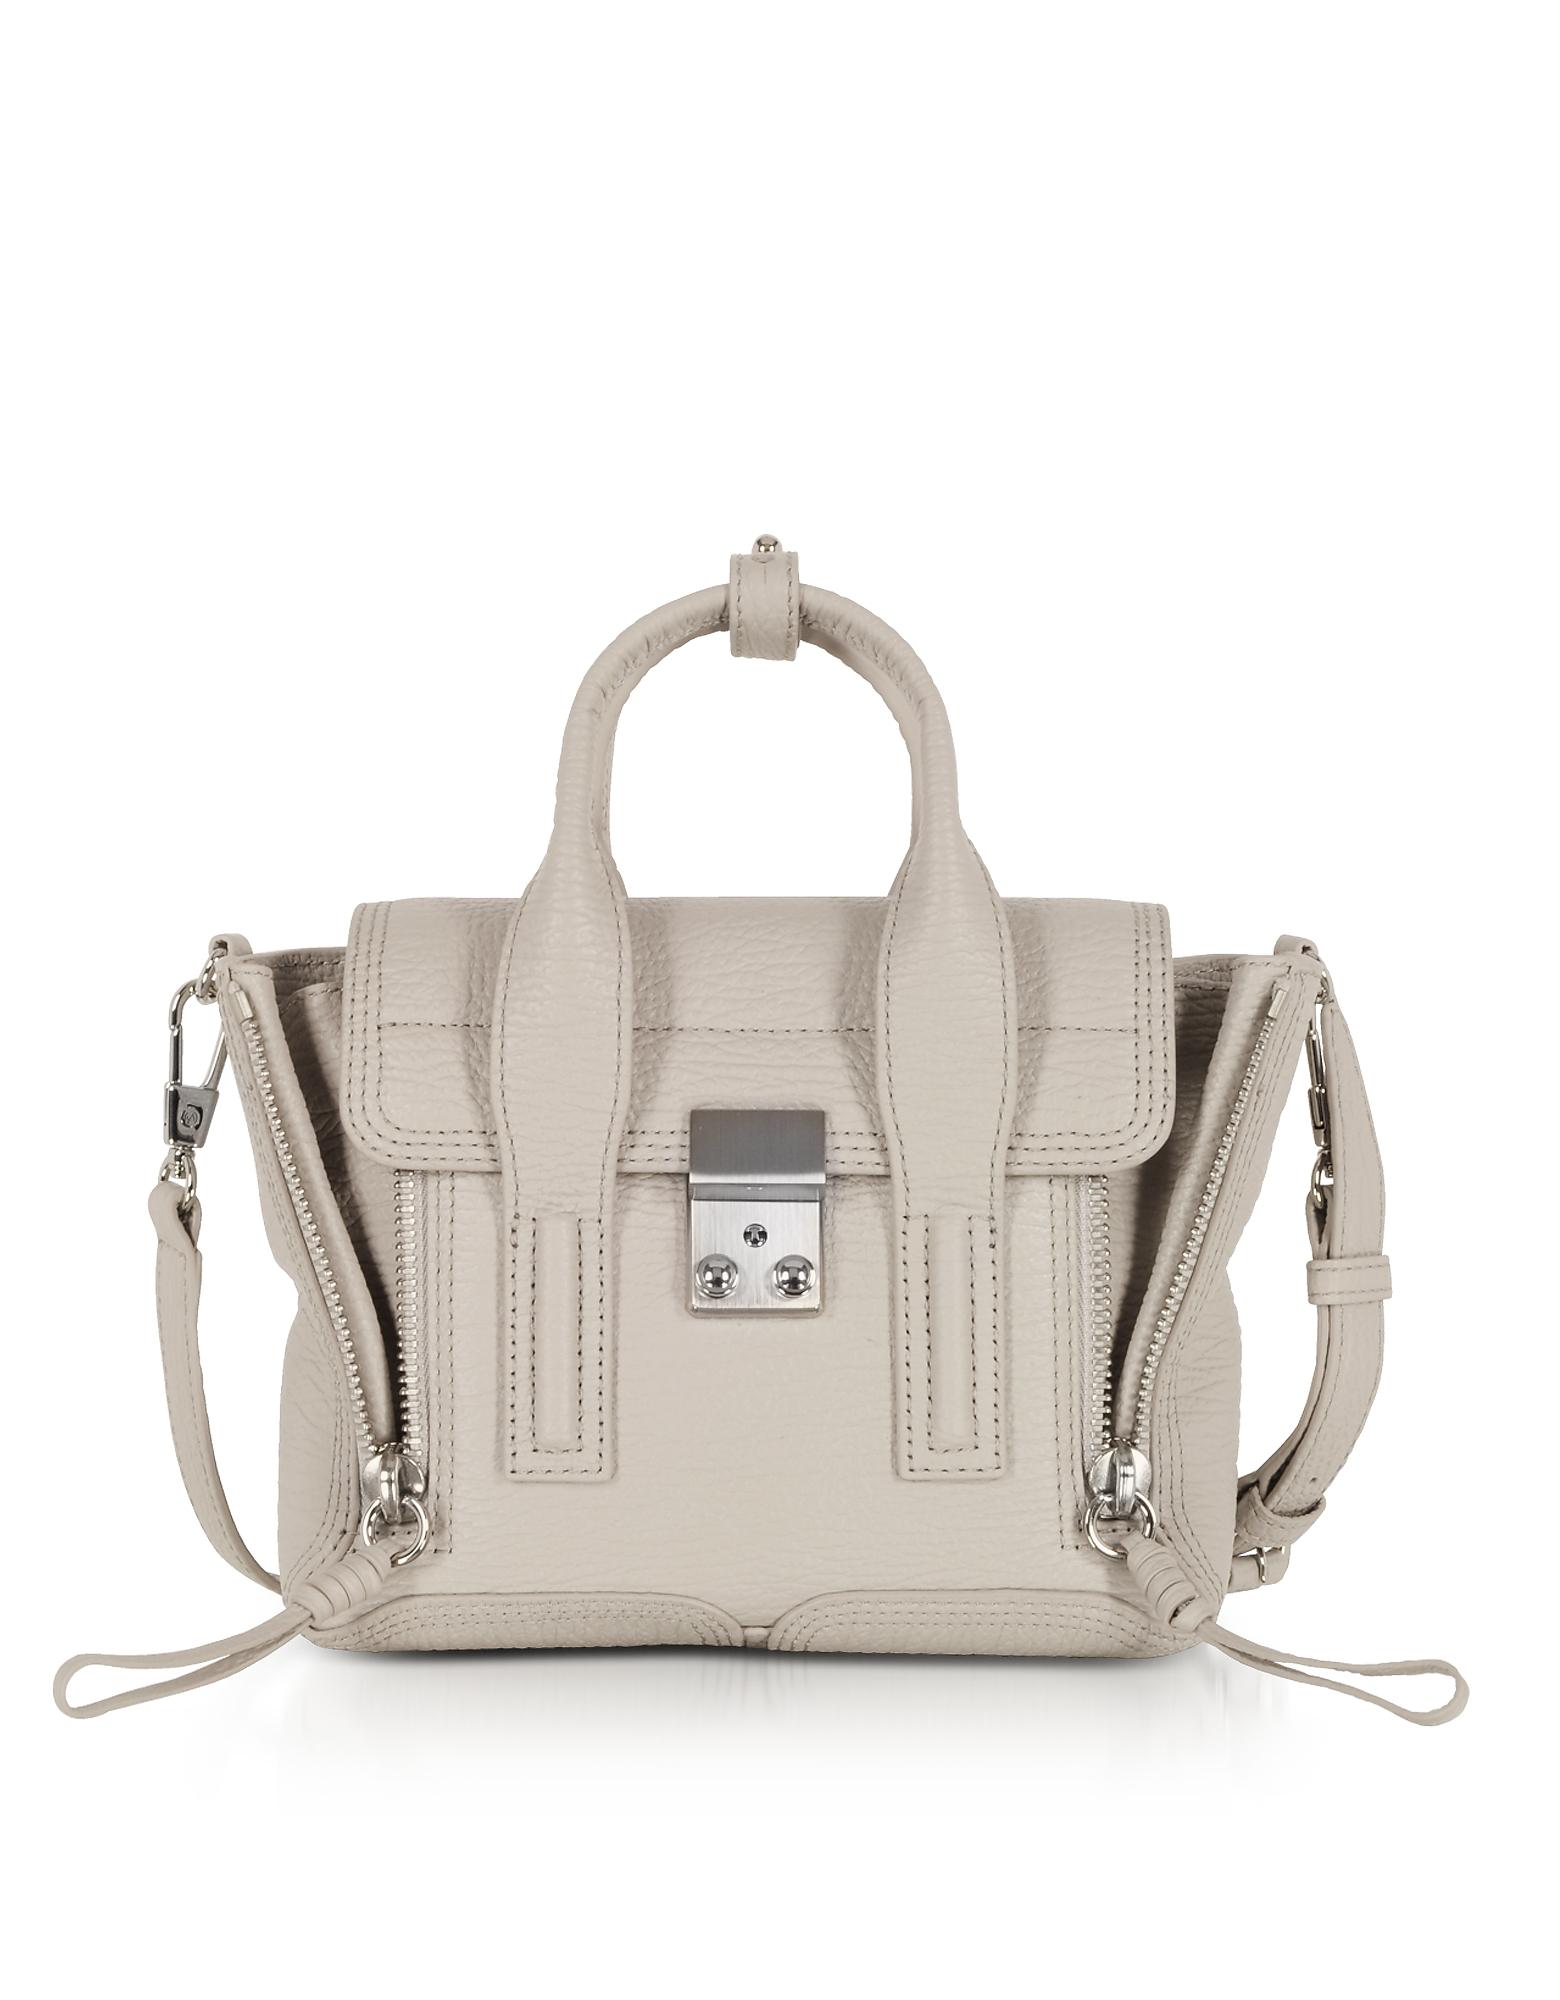 Feather Leather Pashli Mini Satchel Bag, Light gray